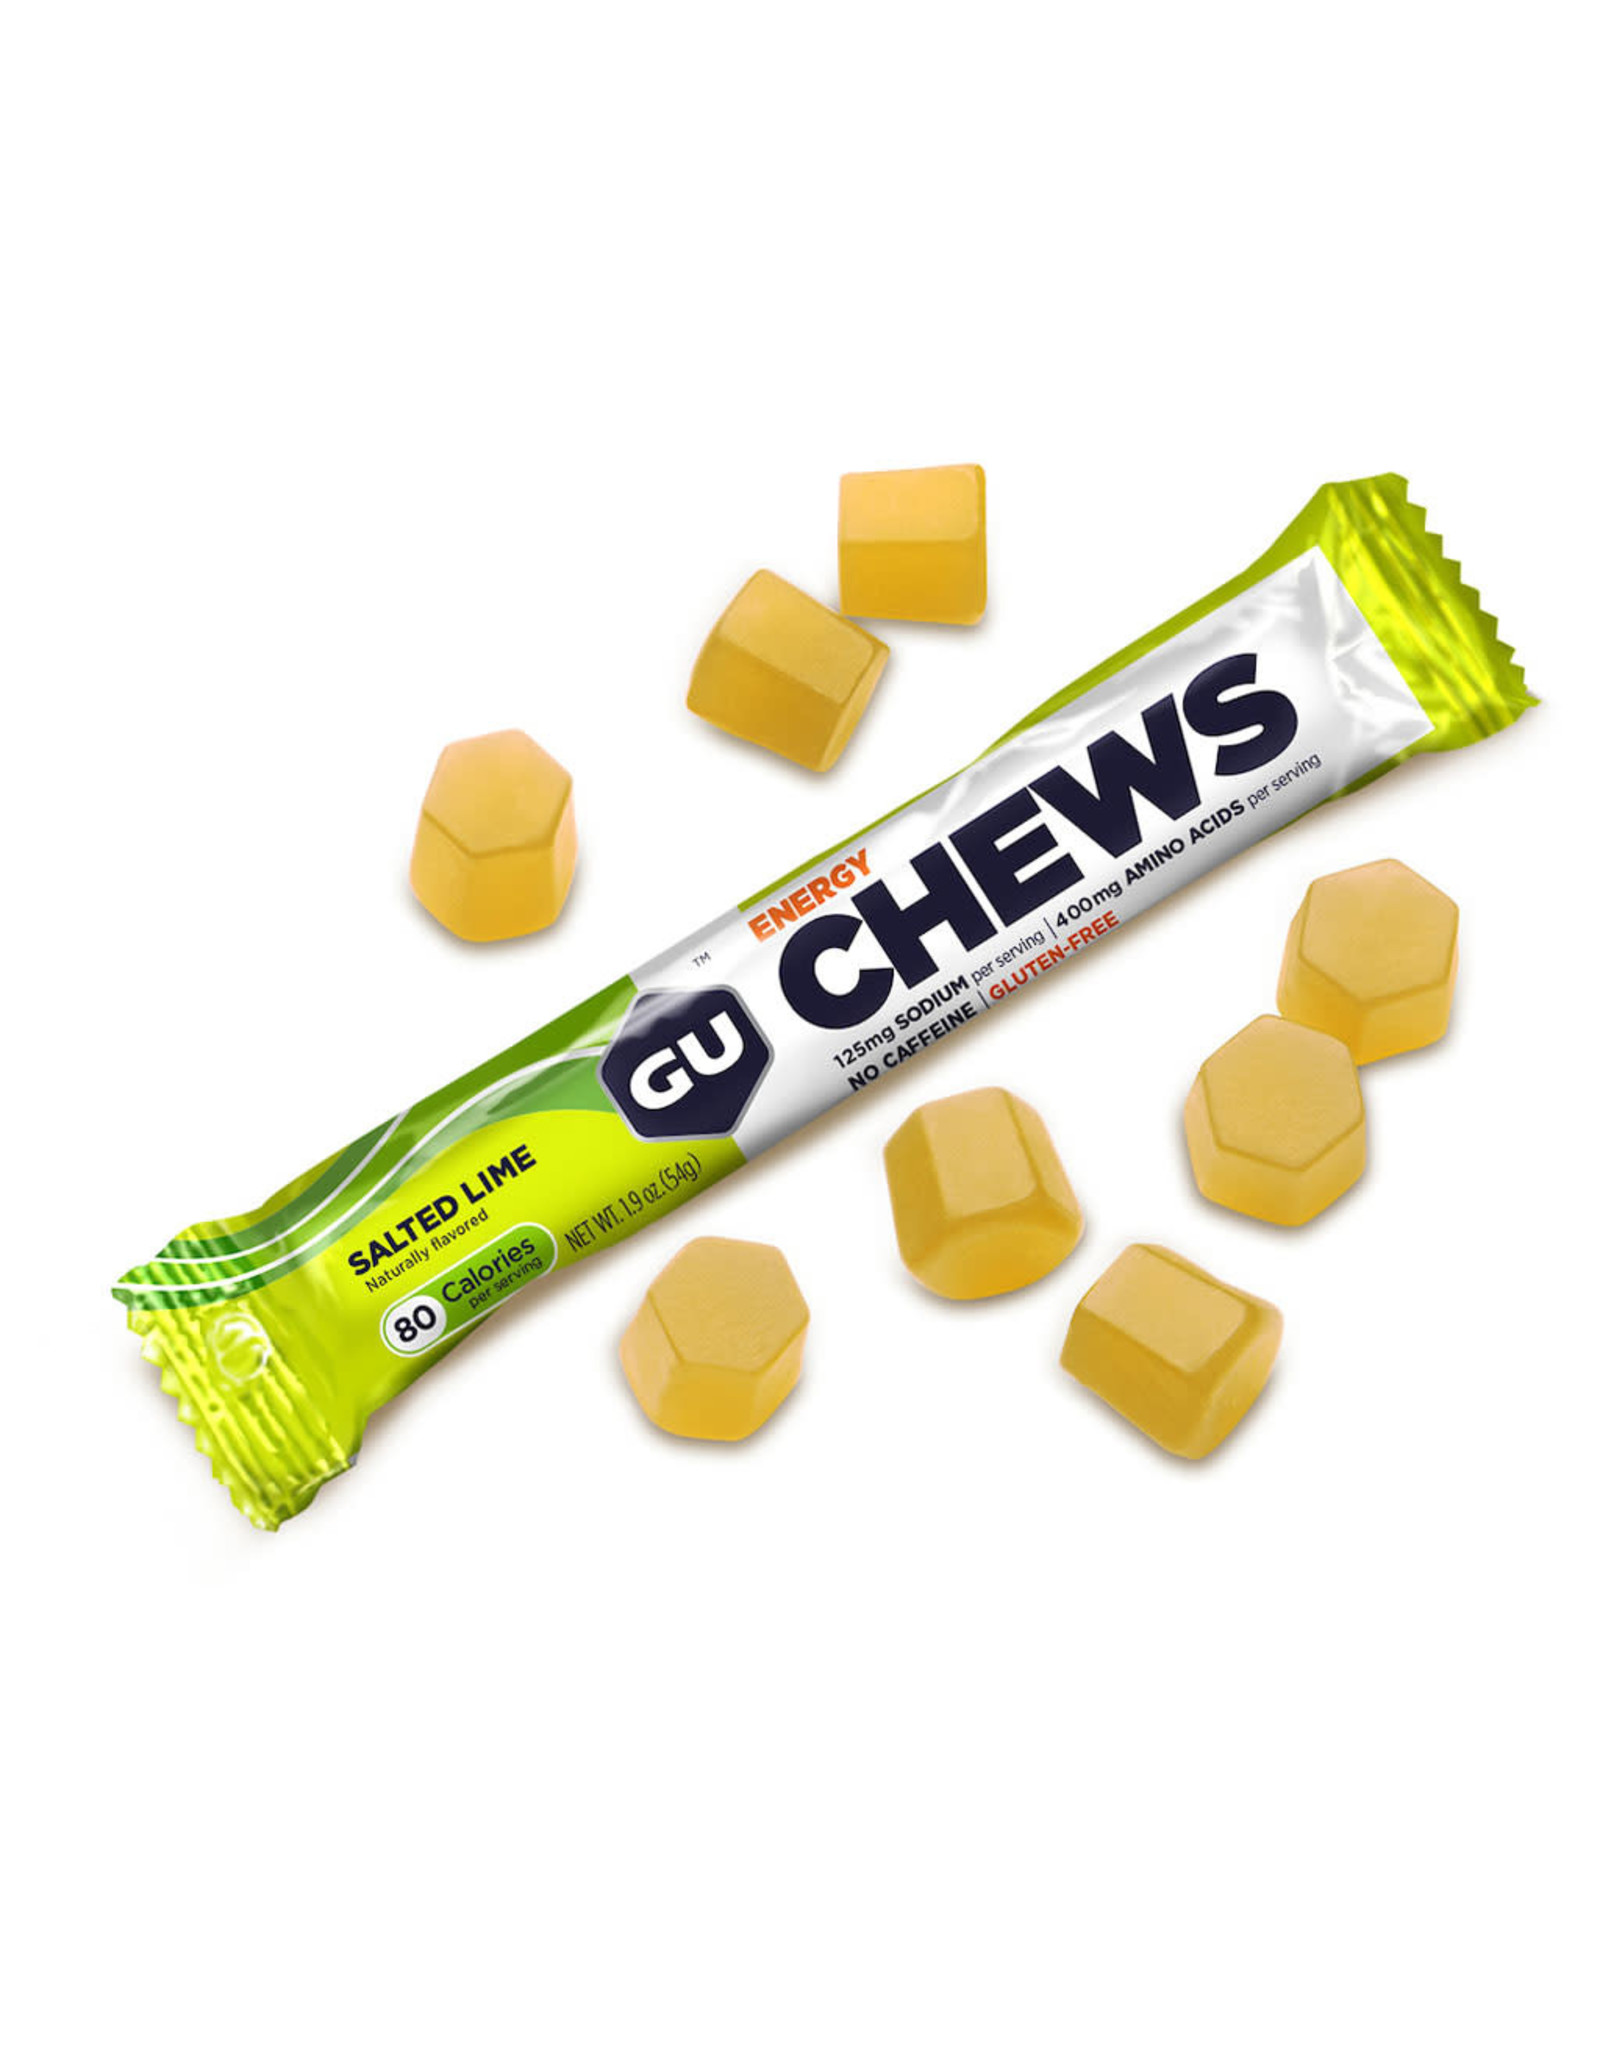 GU Energy Labs Gu Salted Lime Chews Box of 18 single